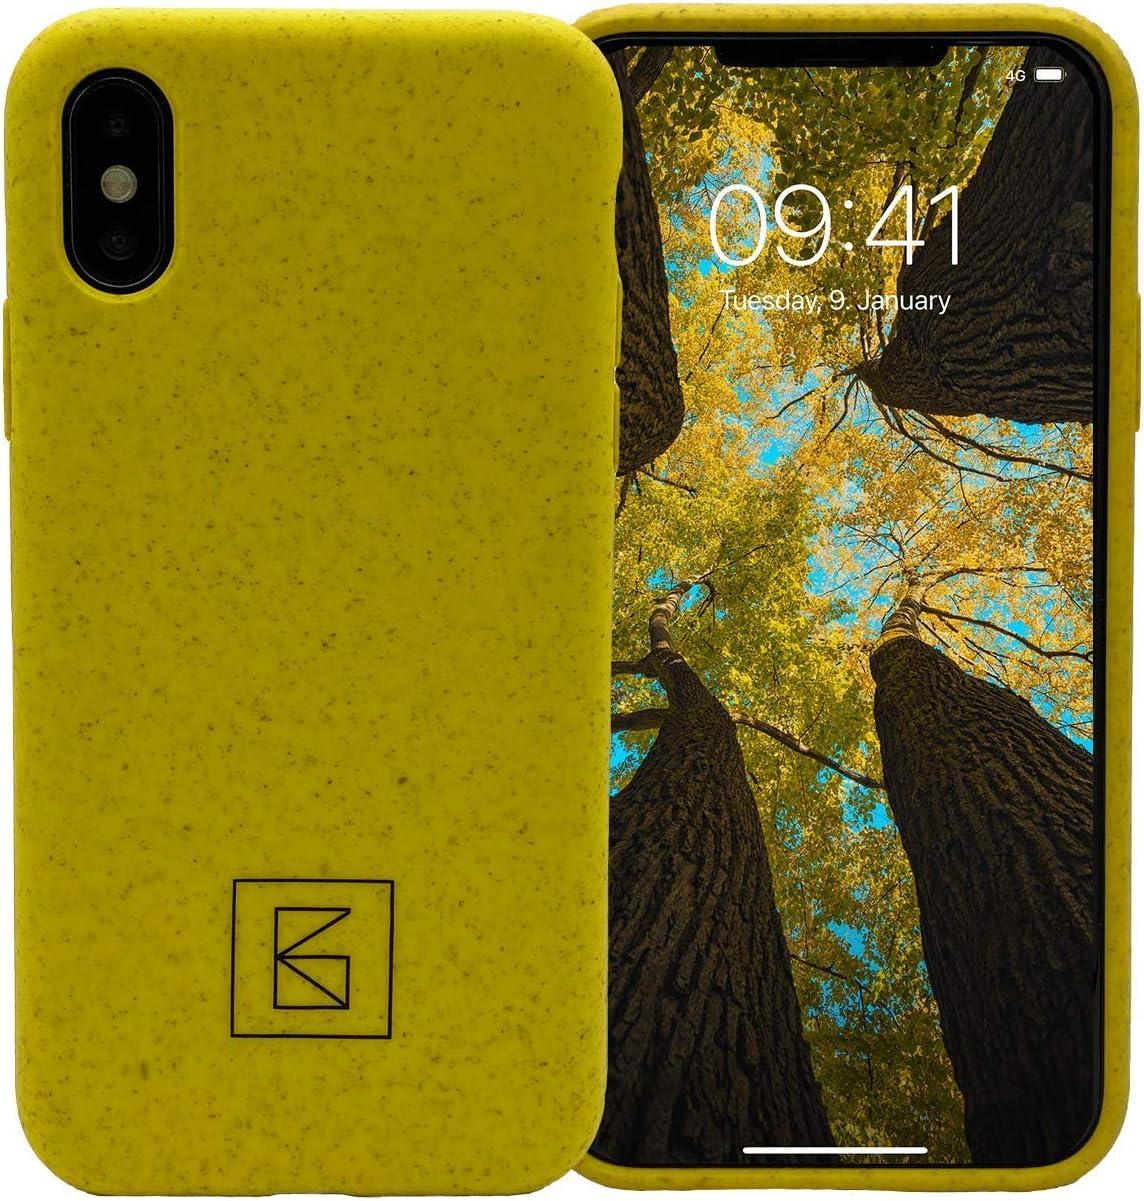 Infenity Case Bio Handyhülle Kompatibel Mit Iphone X Elektronik